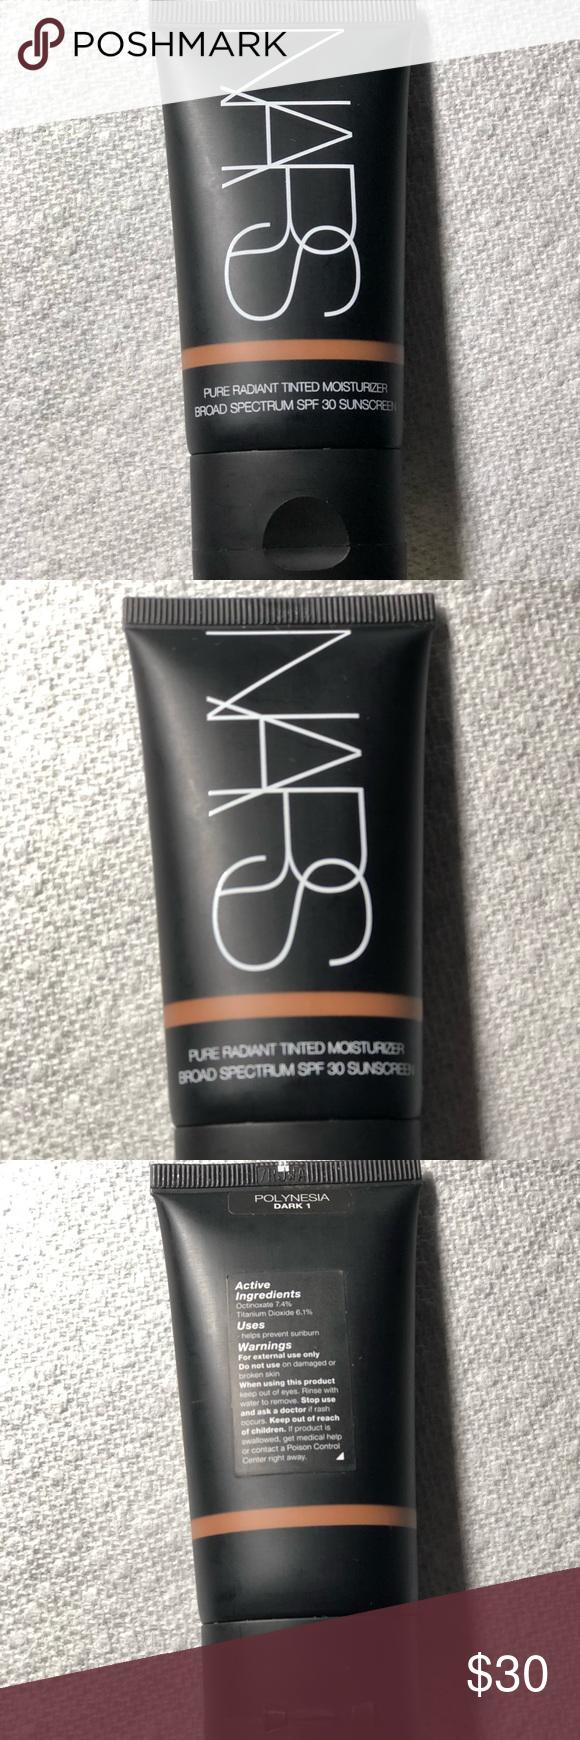 NARS Pure Radiant Tinted Moisturizer Tinted moisturizer